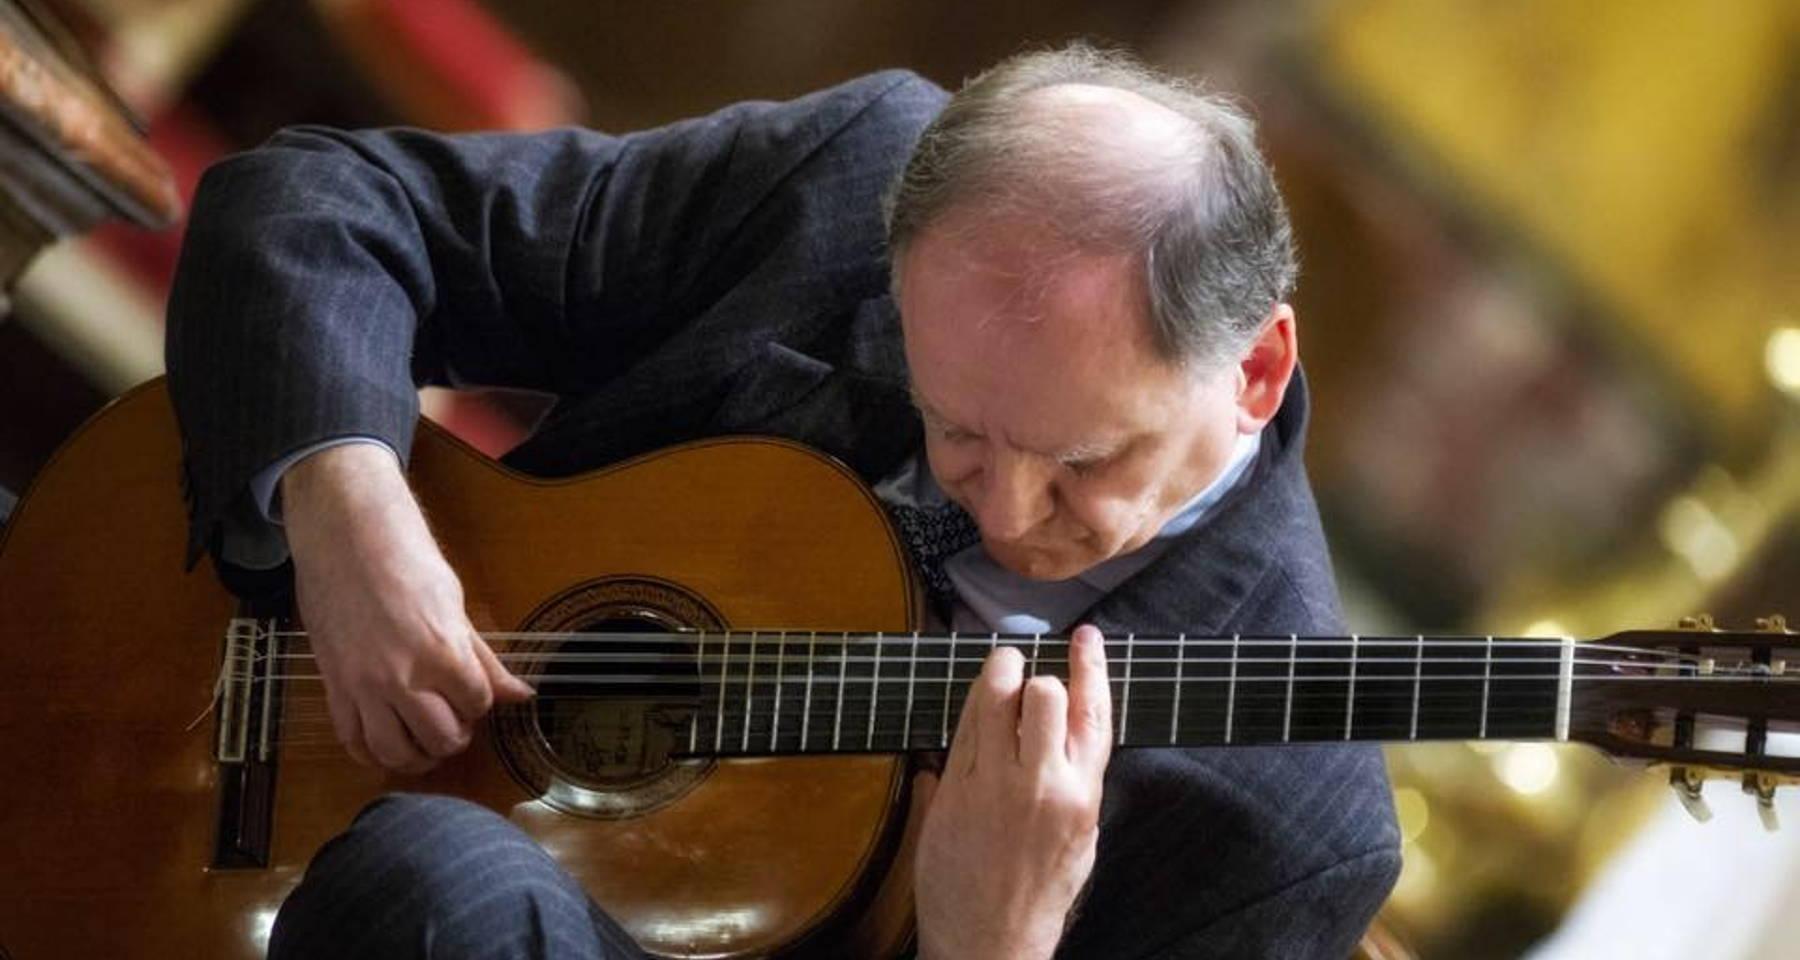 Guitarist Prof.Piero Bongauri, performs  Bach, Haendel, Sor, Tàrrega, and others